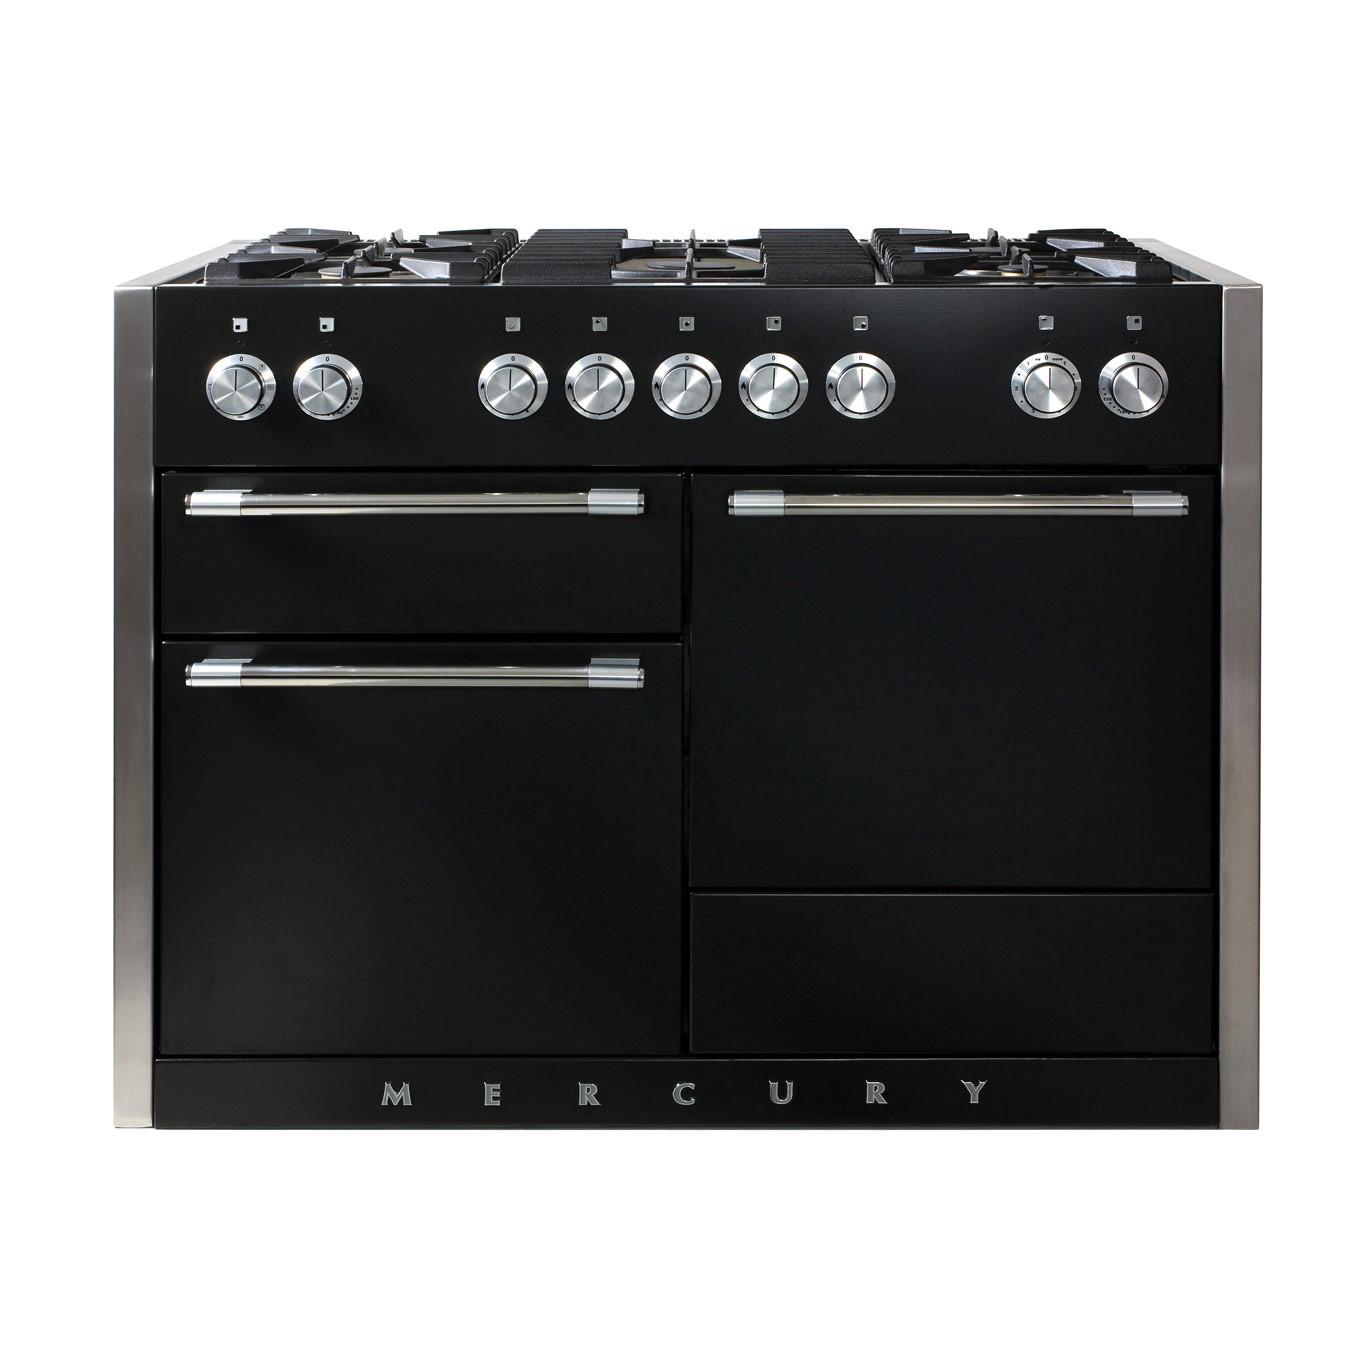 Mercury MCY1200DF Dual Fuel Ash Black Range Cooker